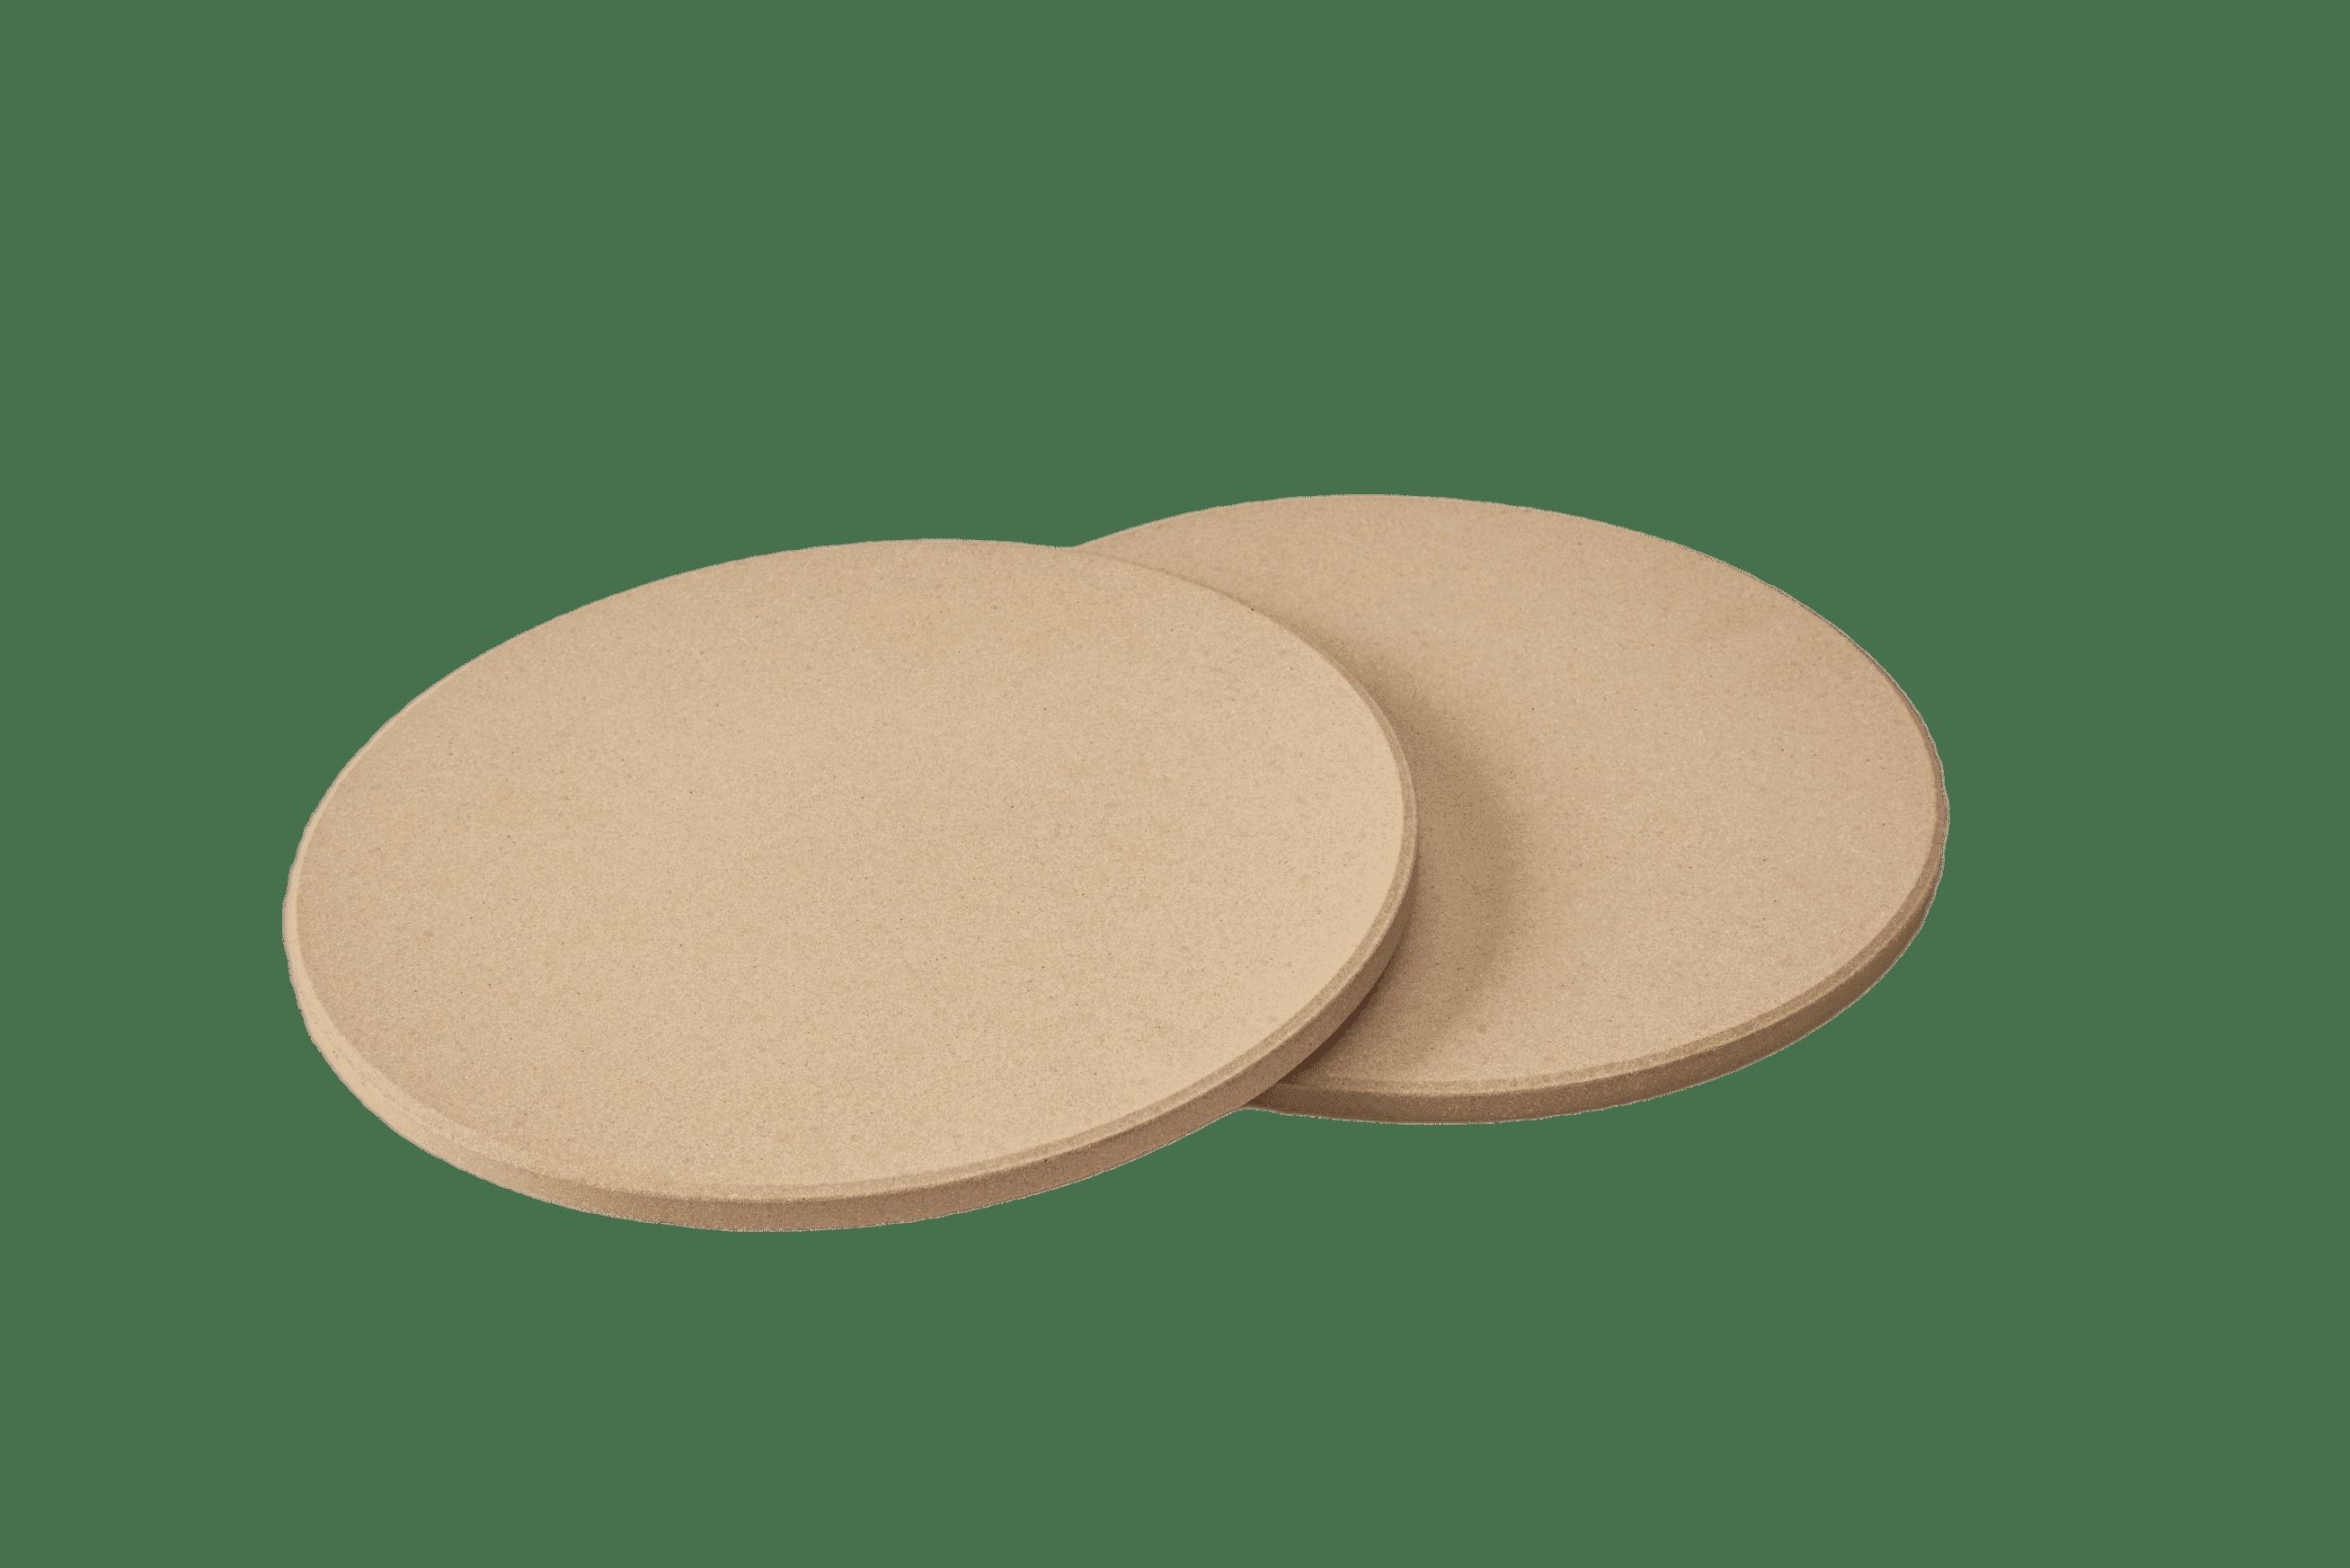 Pizzasteen travelq, ø 25cm (2 stuks)